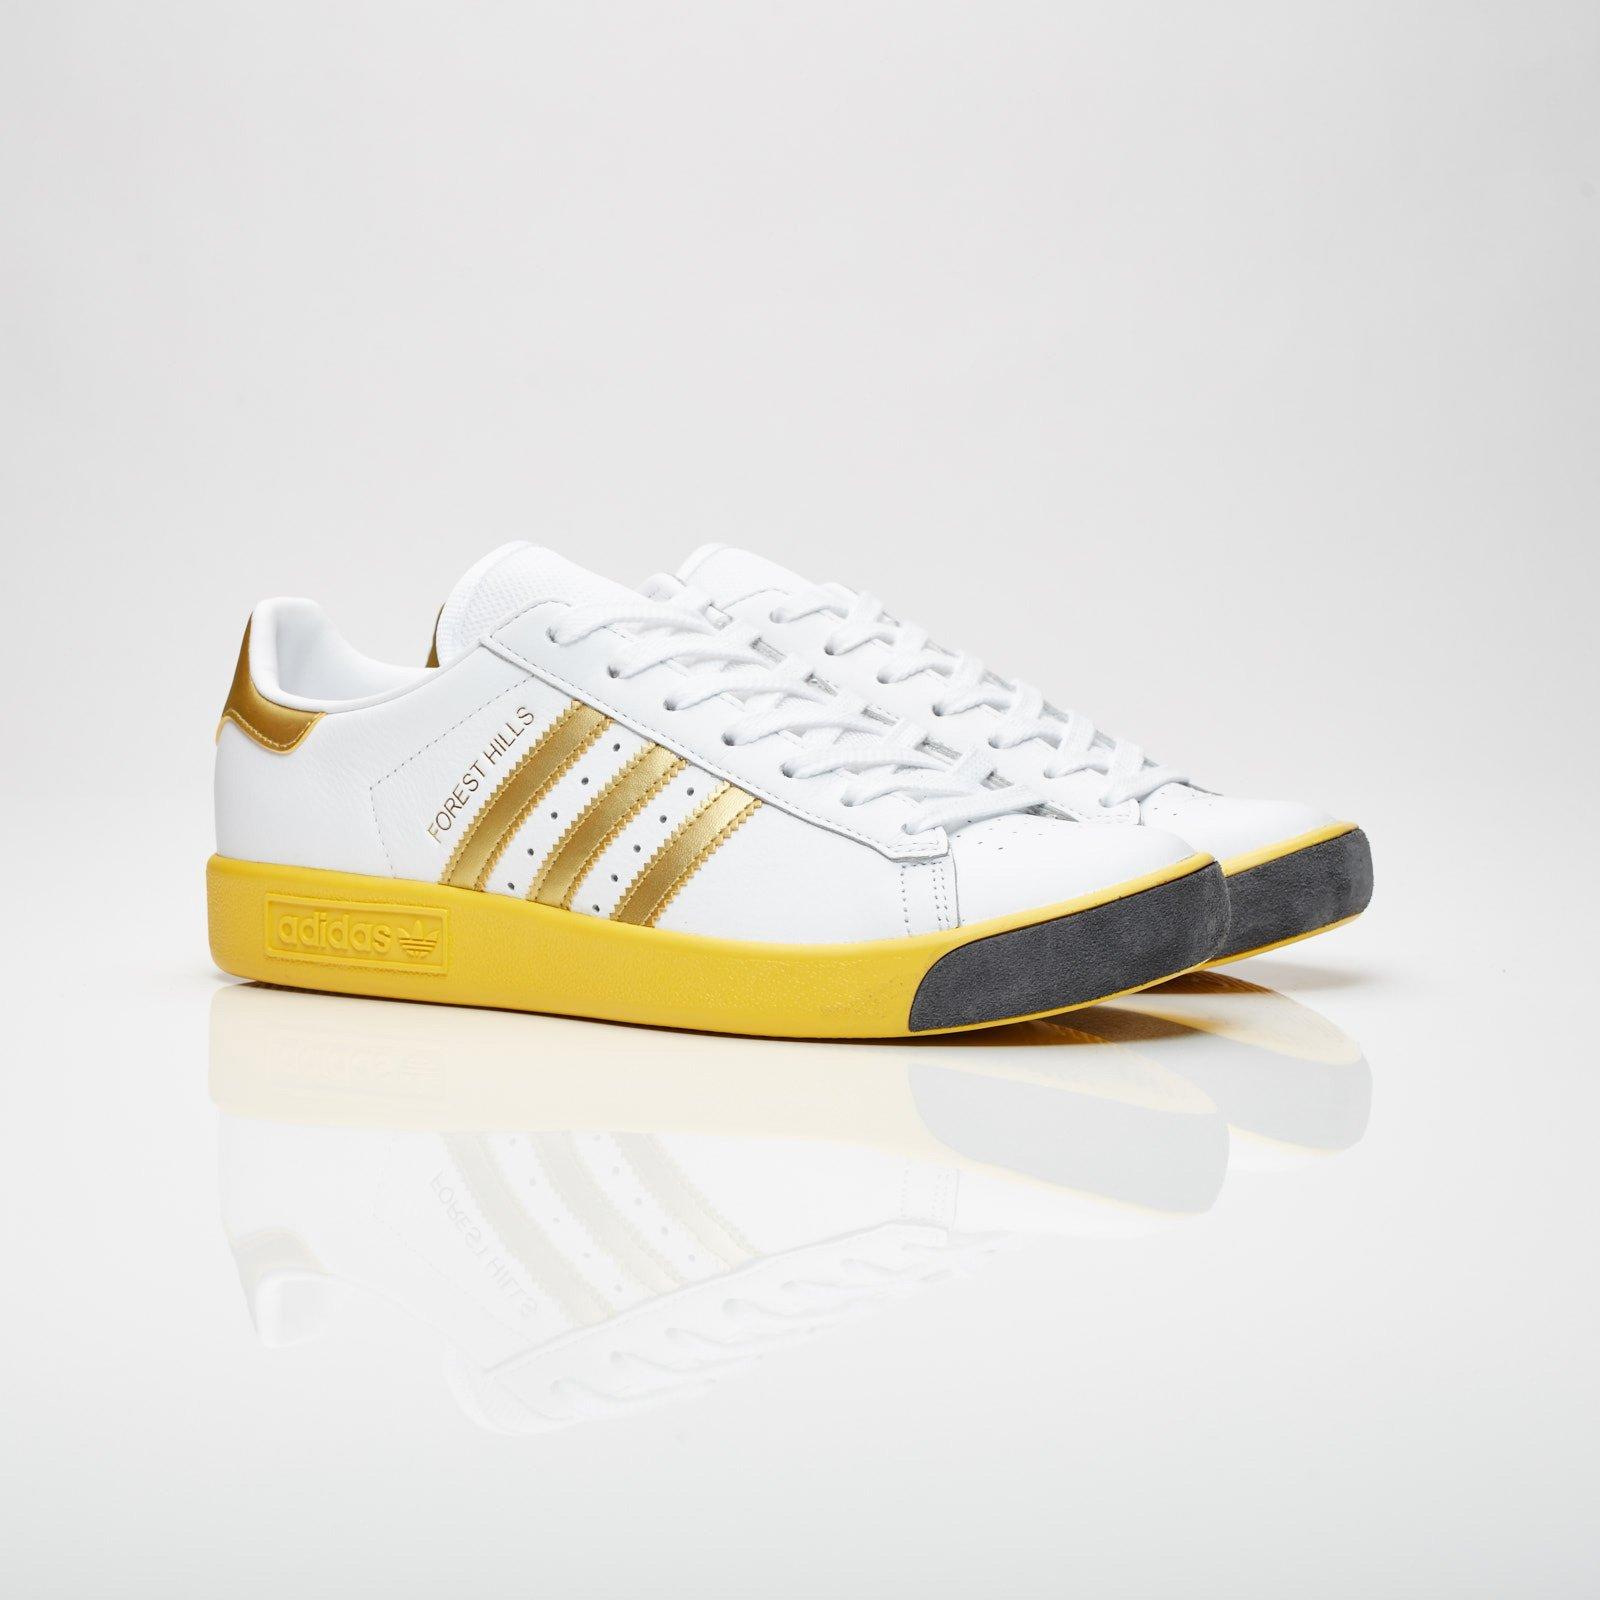 adidas Forest Hills - Cq2083